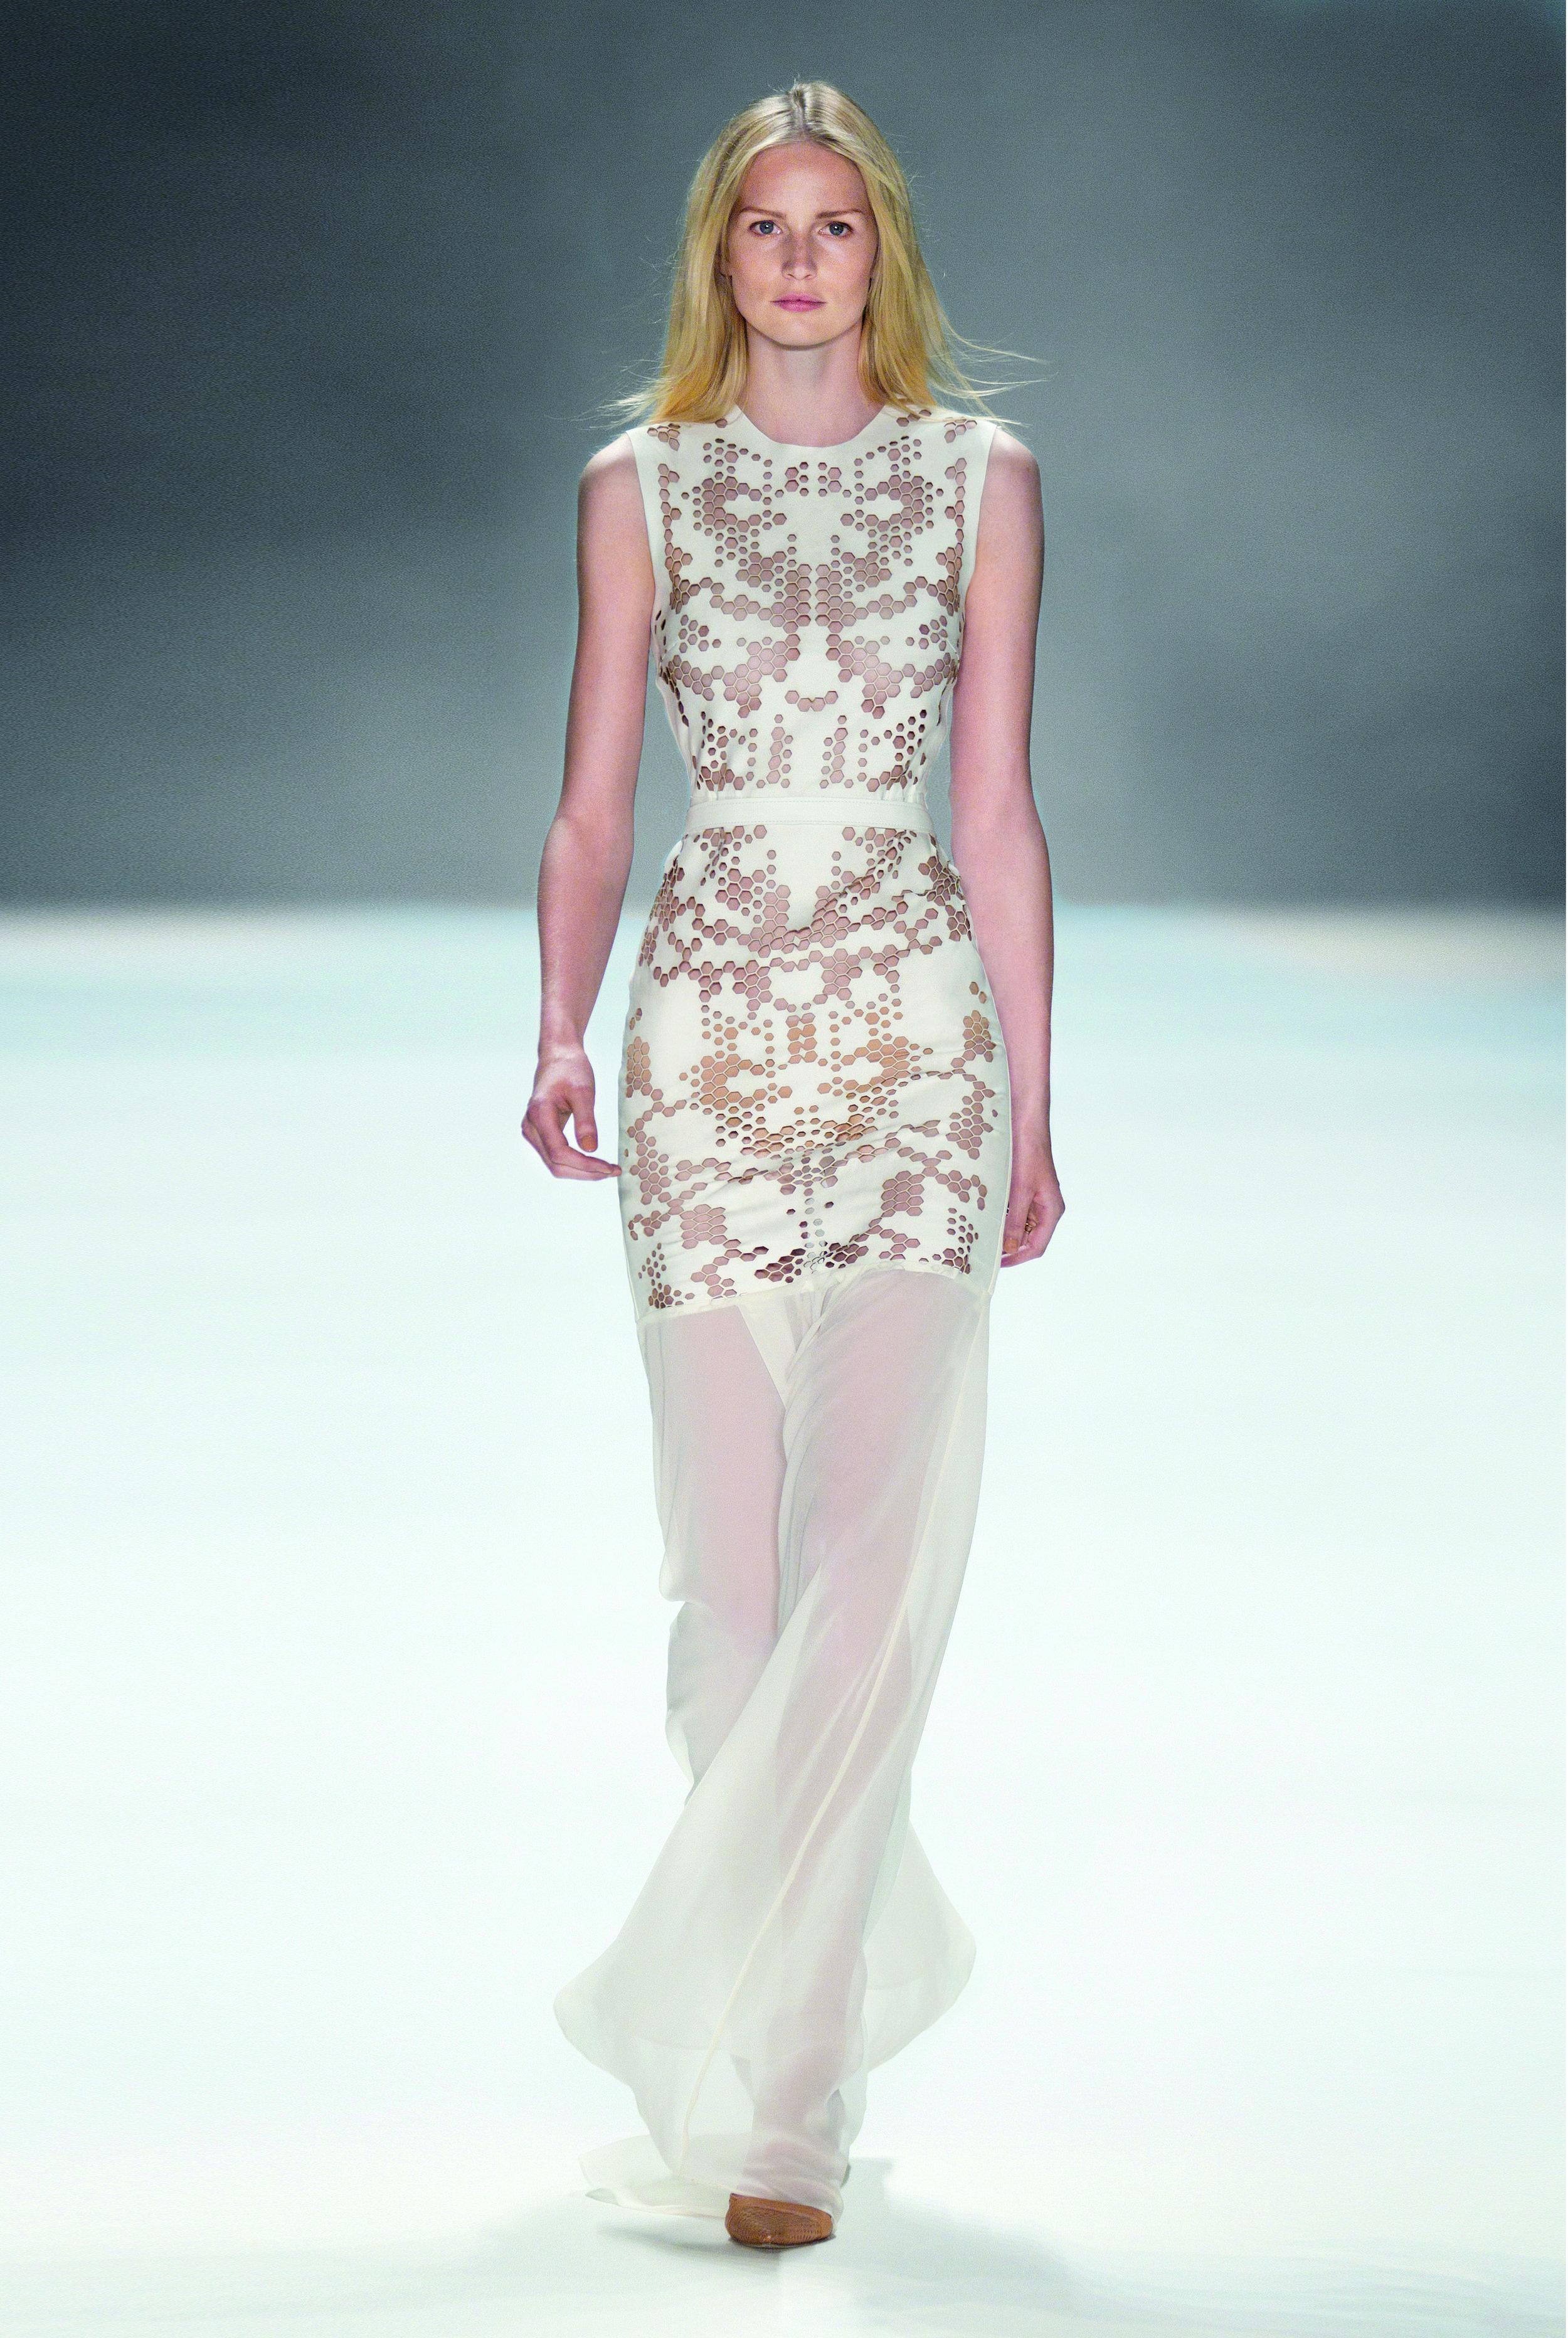 The crazy wedding dress with lasercut holes at Berlin Fashion Week 2013 ©Dan & Corina Lecca